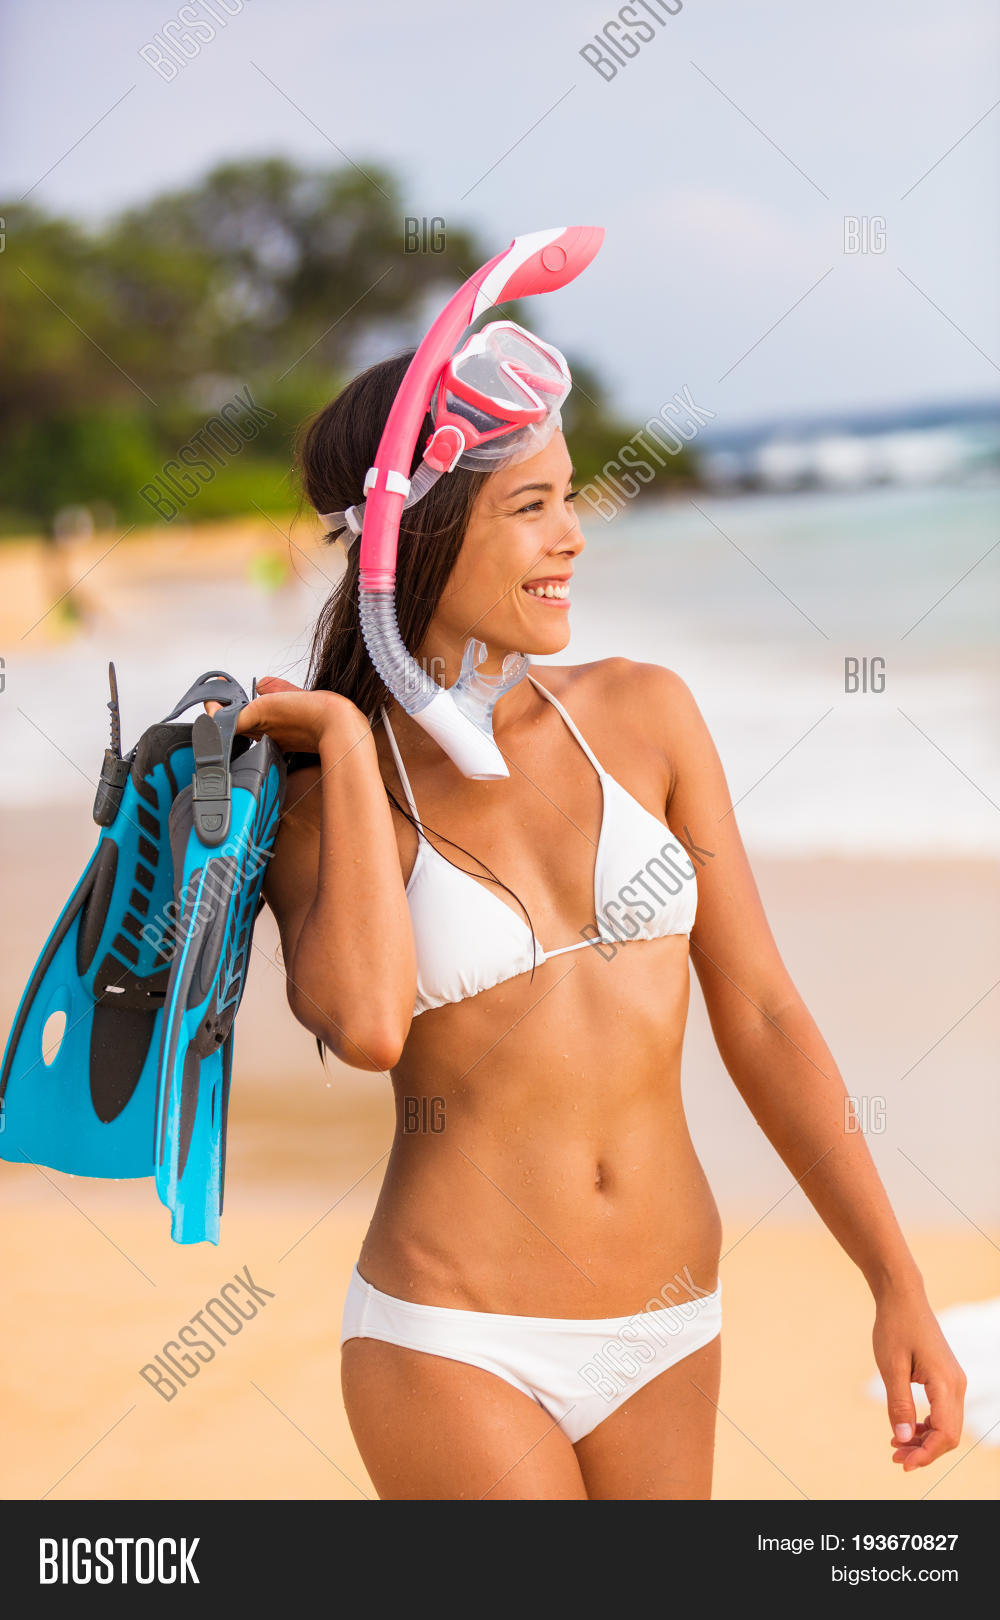 Duly free beach bikini photographs congratulate